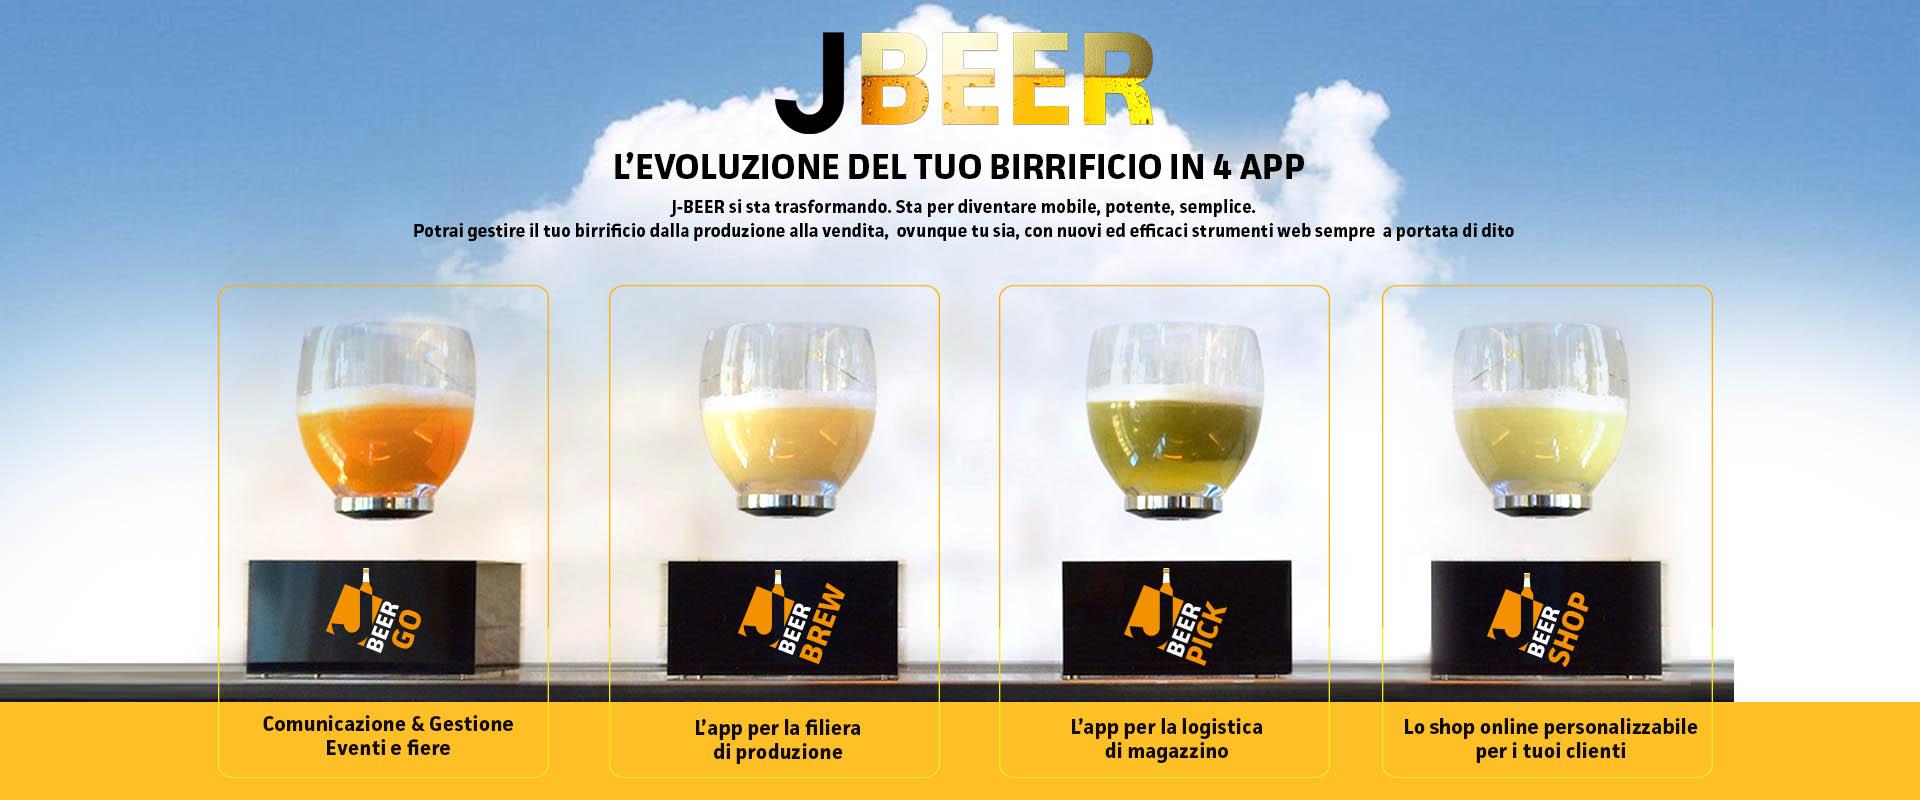 gestionale telematico j-beer - app per il birrificio j-software